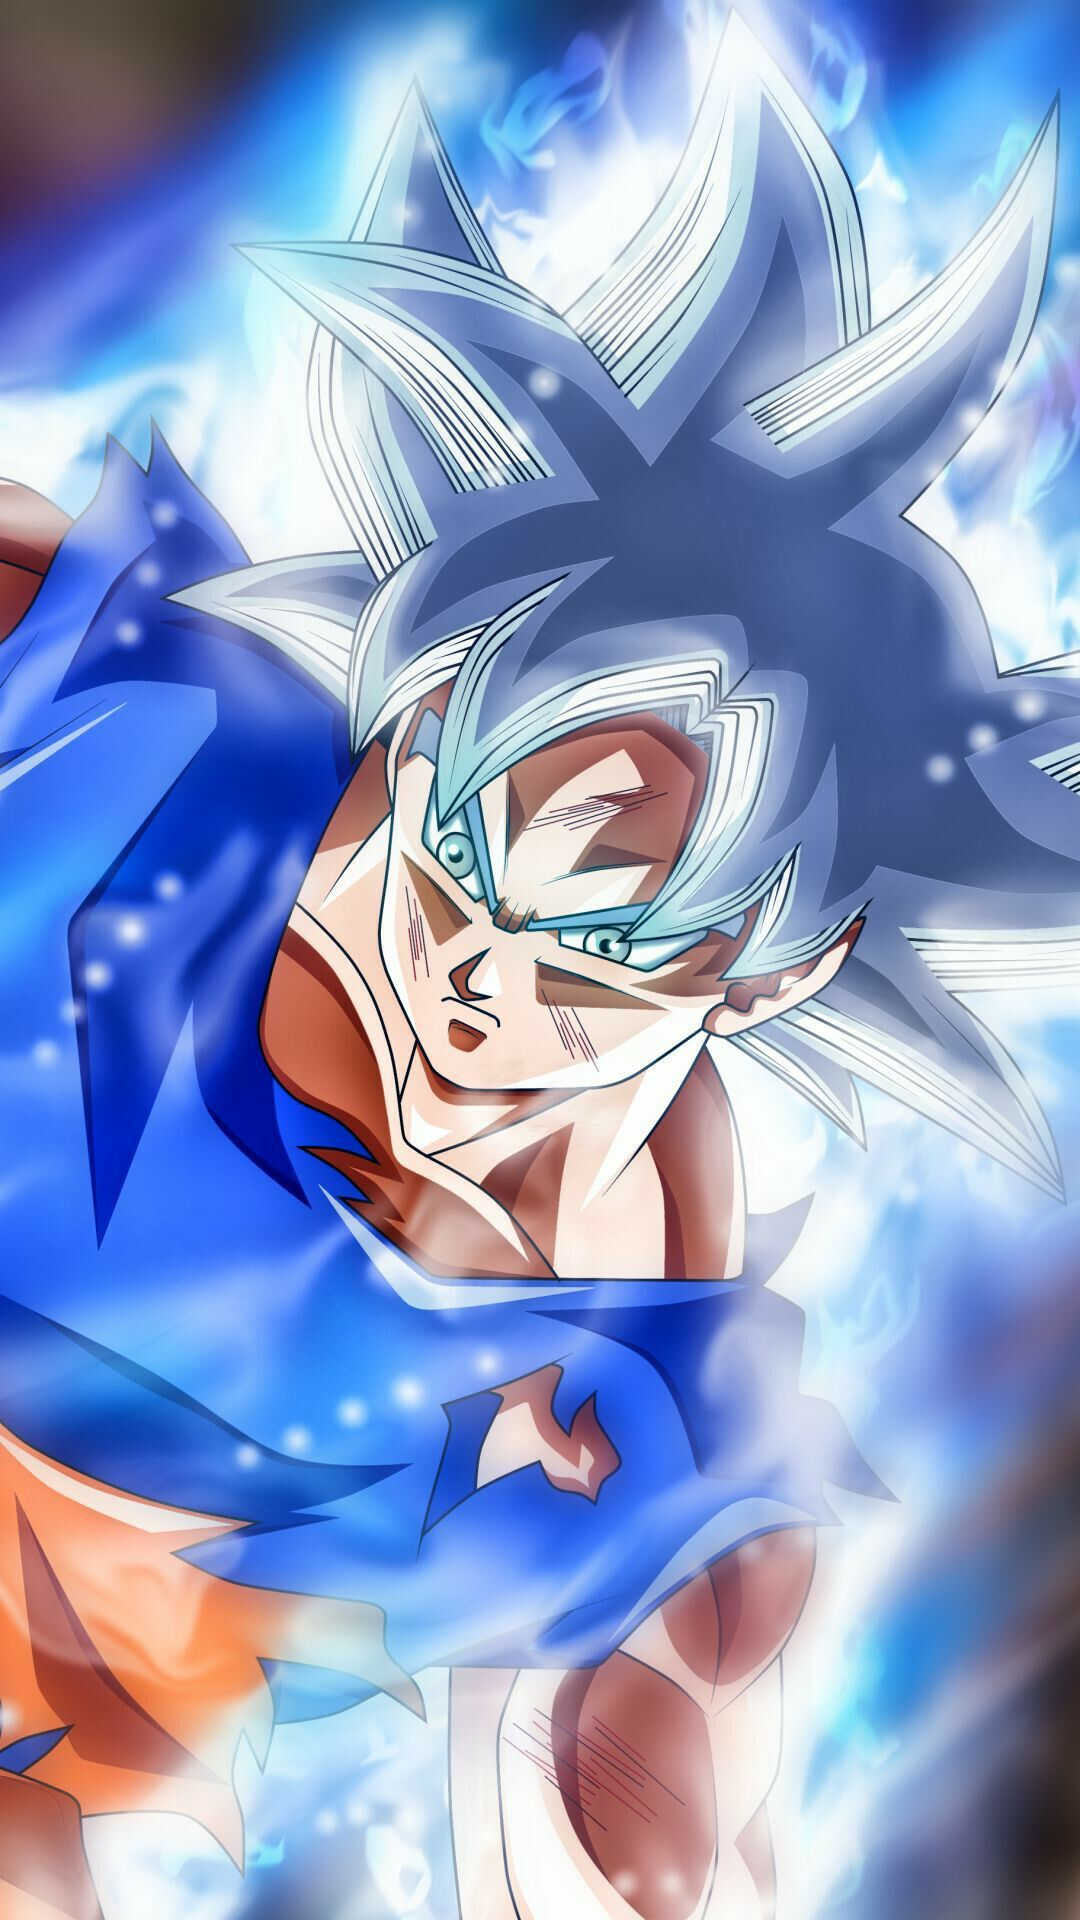 Pin De Hendie Purwiliarto En Phone Backgrounds Cartoon 08 Personajes De Dragon Ball Dragon Ball Gt Personajes De Goku